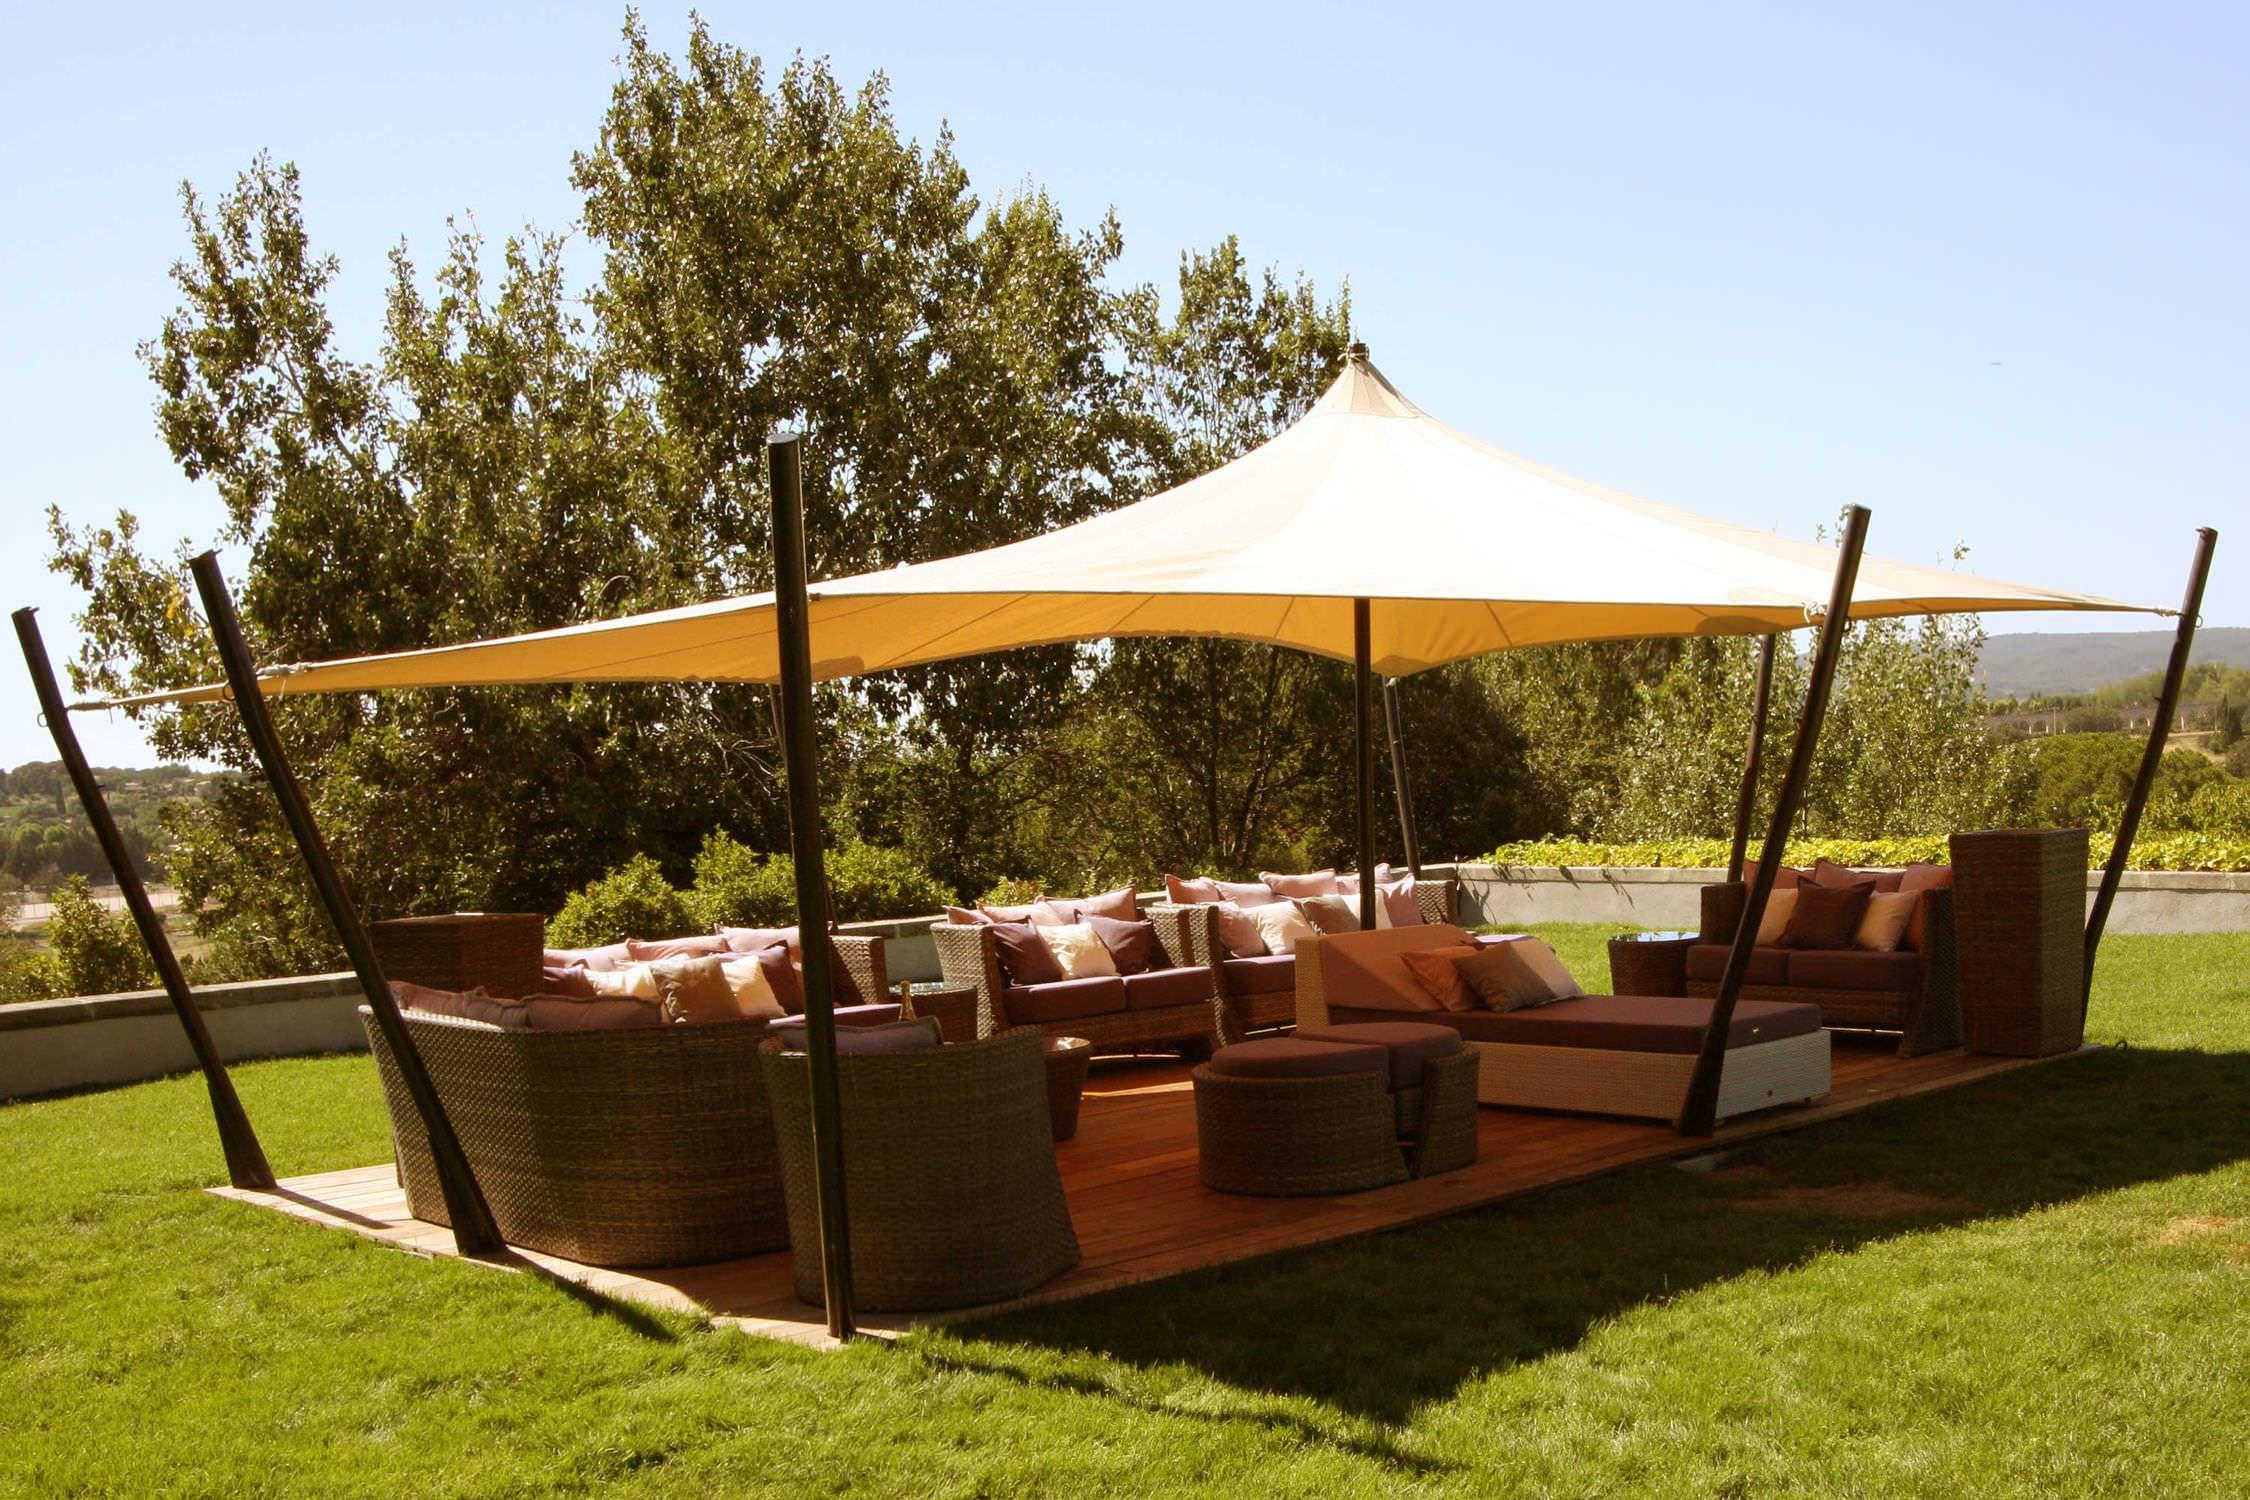 Fabric roof gazebo - TENTE TOUAREG JARDIN AIXOIS - Atelier ...